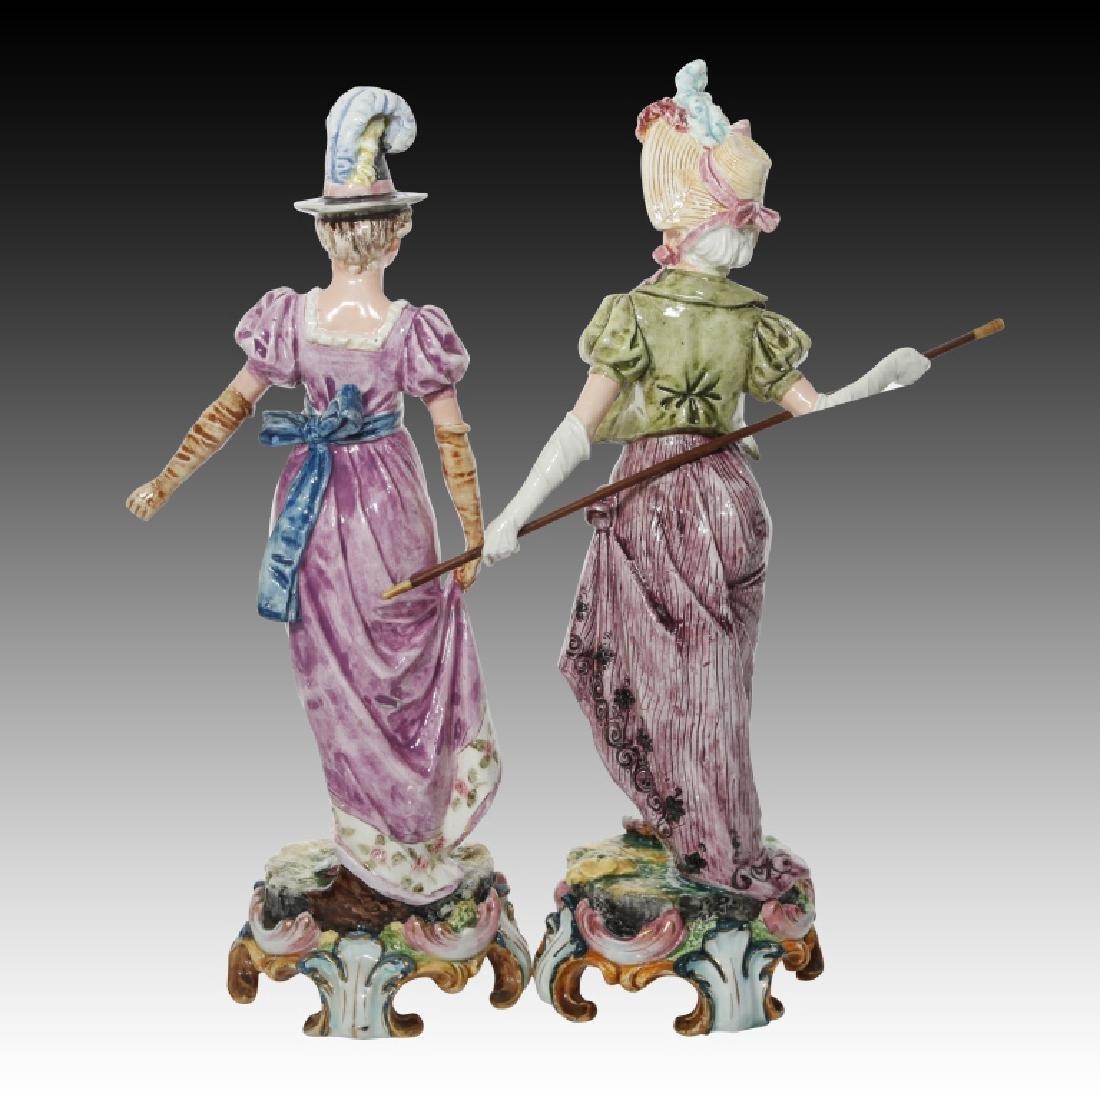 Majolica Figural Pair of Women in Regency Dress - 2